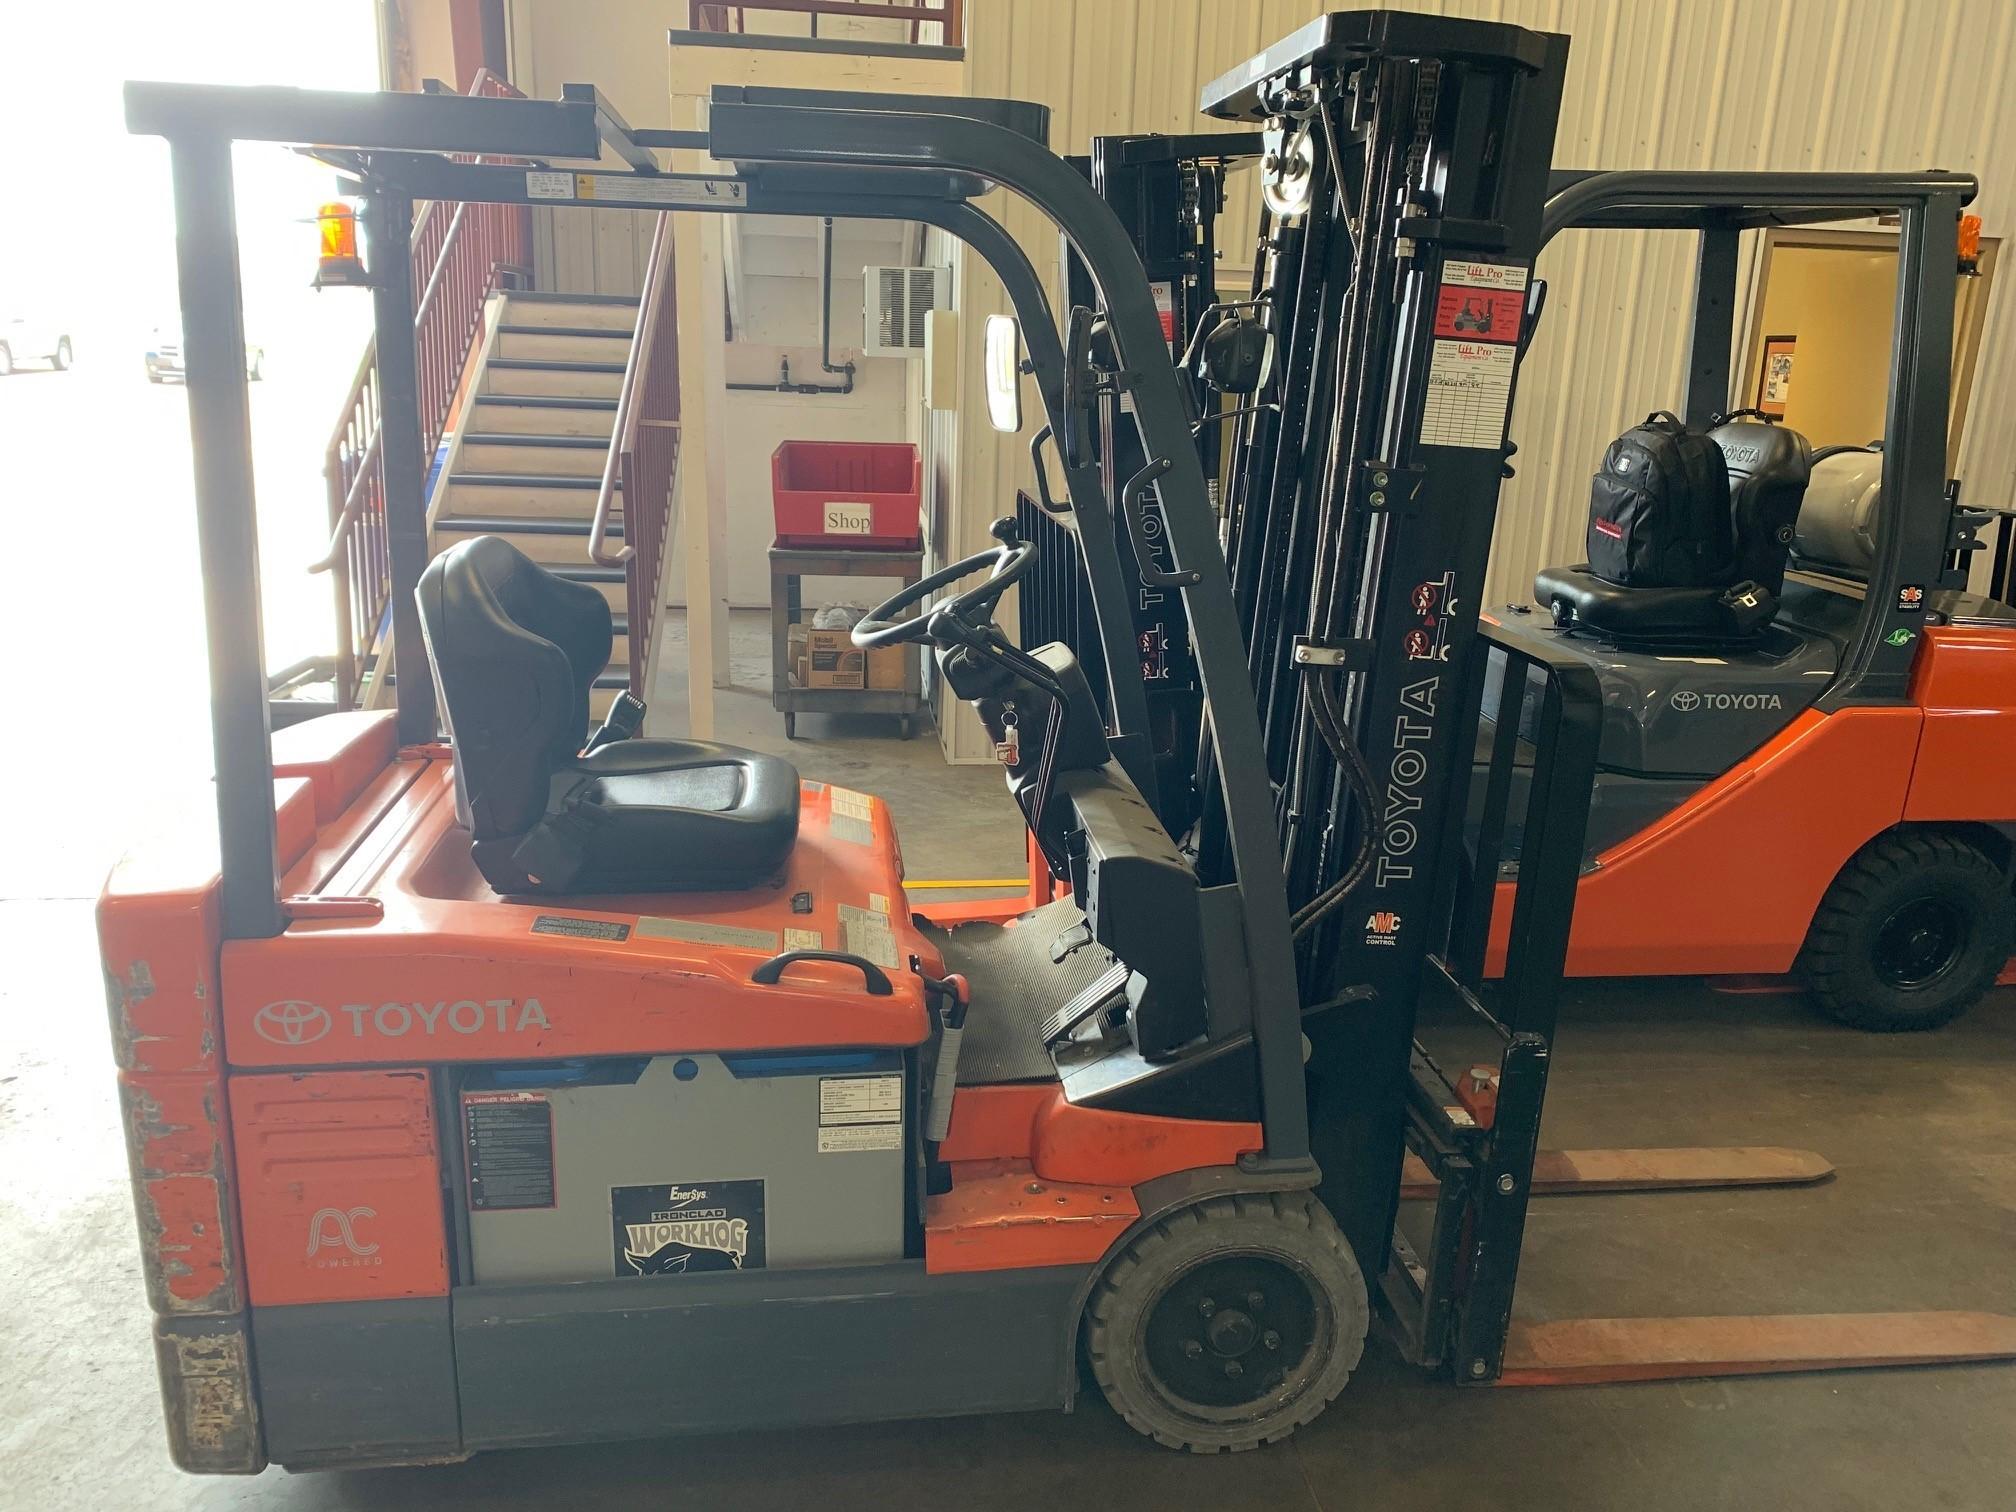 Used, 2014, Toyota Industrial Equipment, 7FBEU20, Forklifts / Lift Trucks